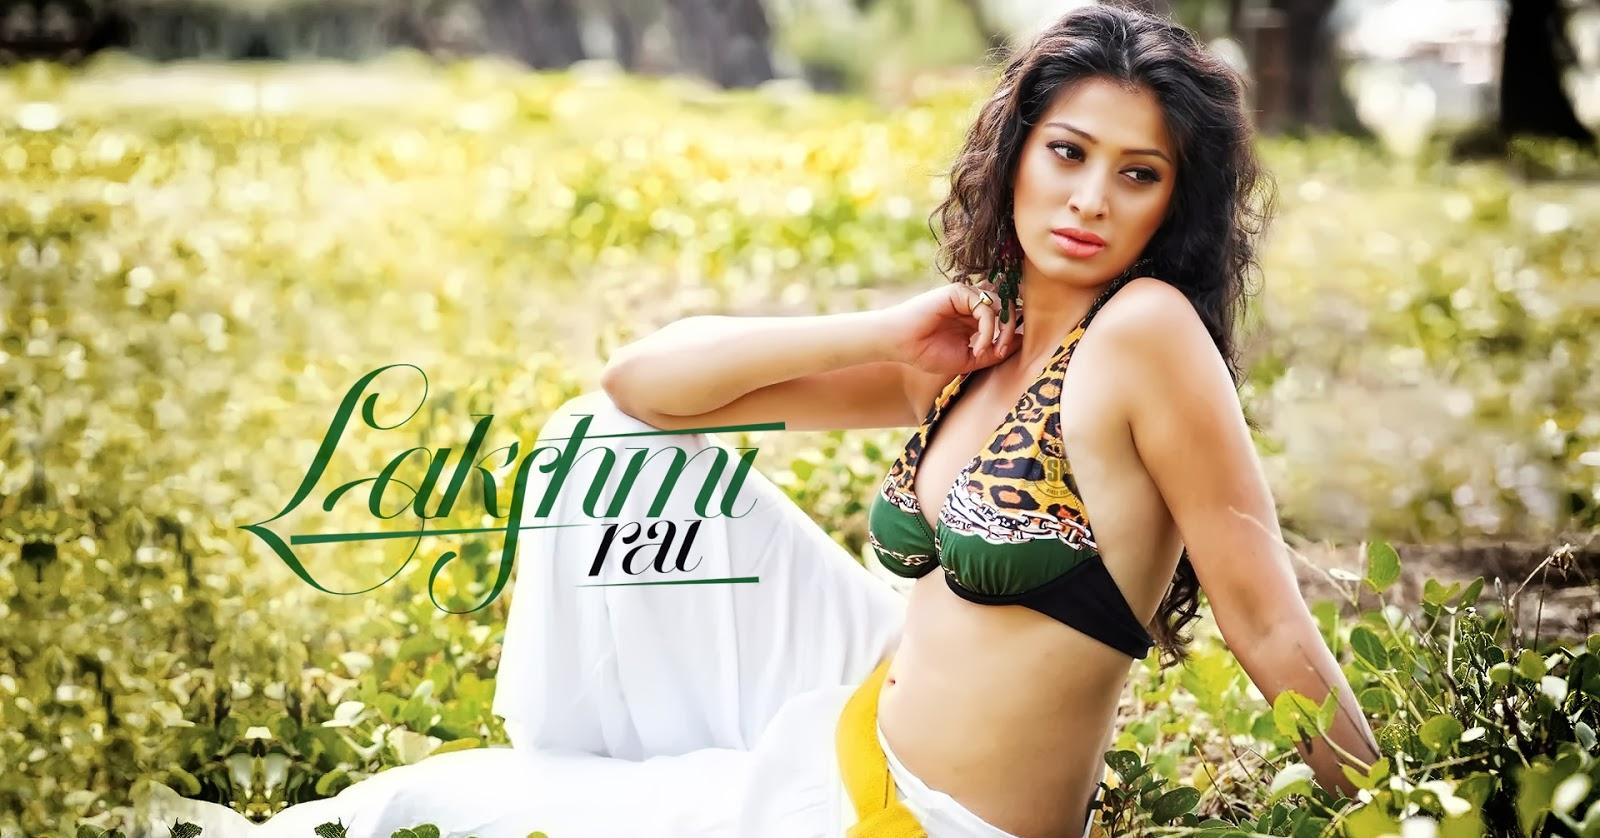 Lakshmi Rai Hd Photos Free Download Actress Host